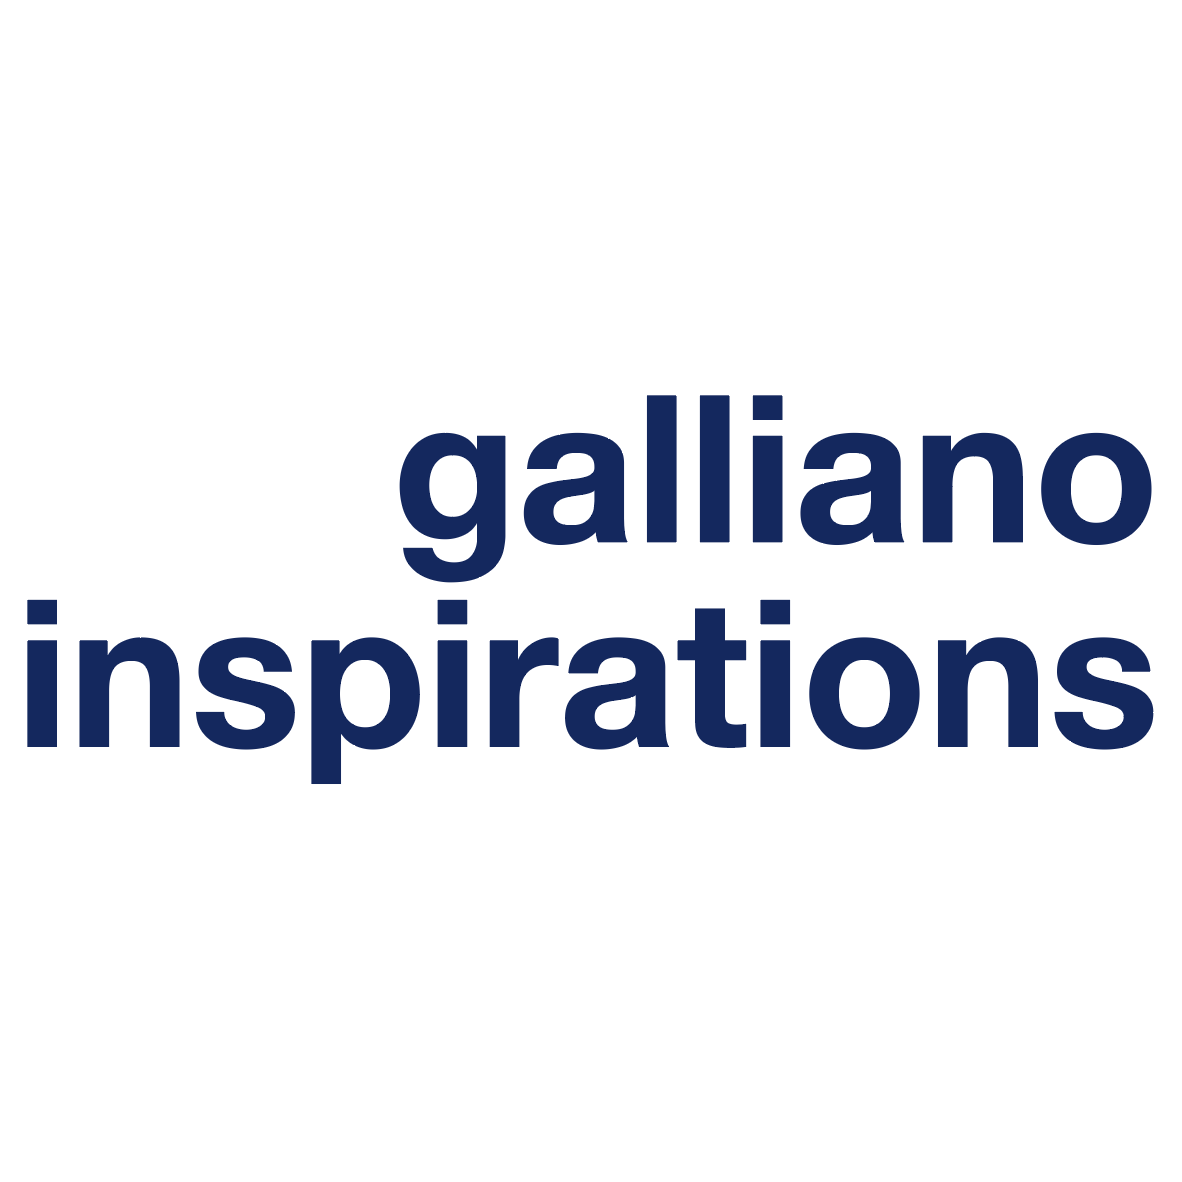 galliano inspirations